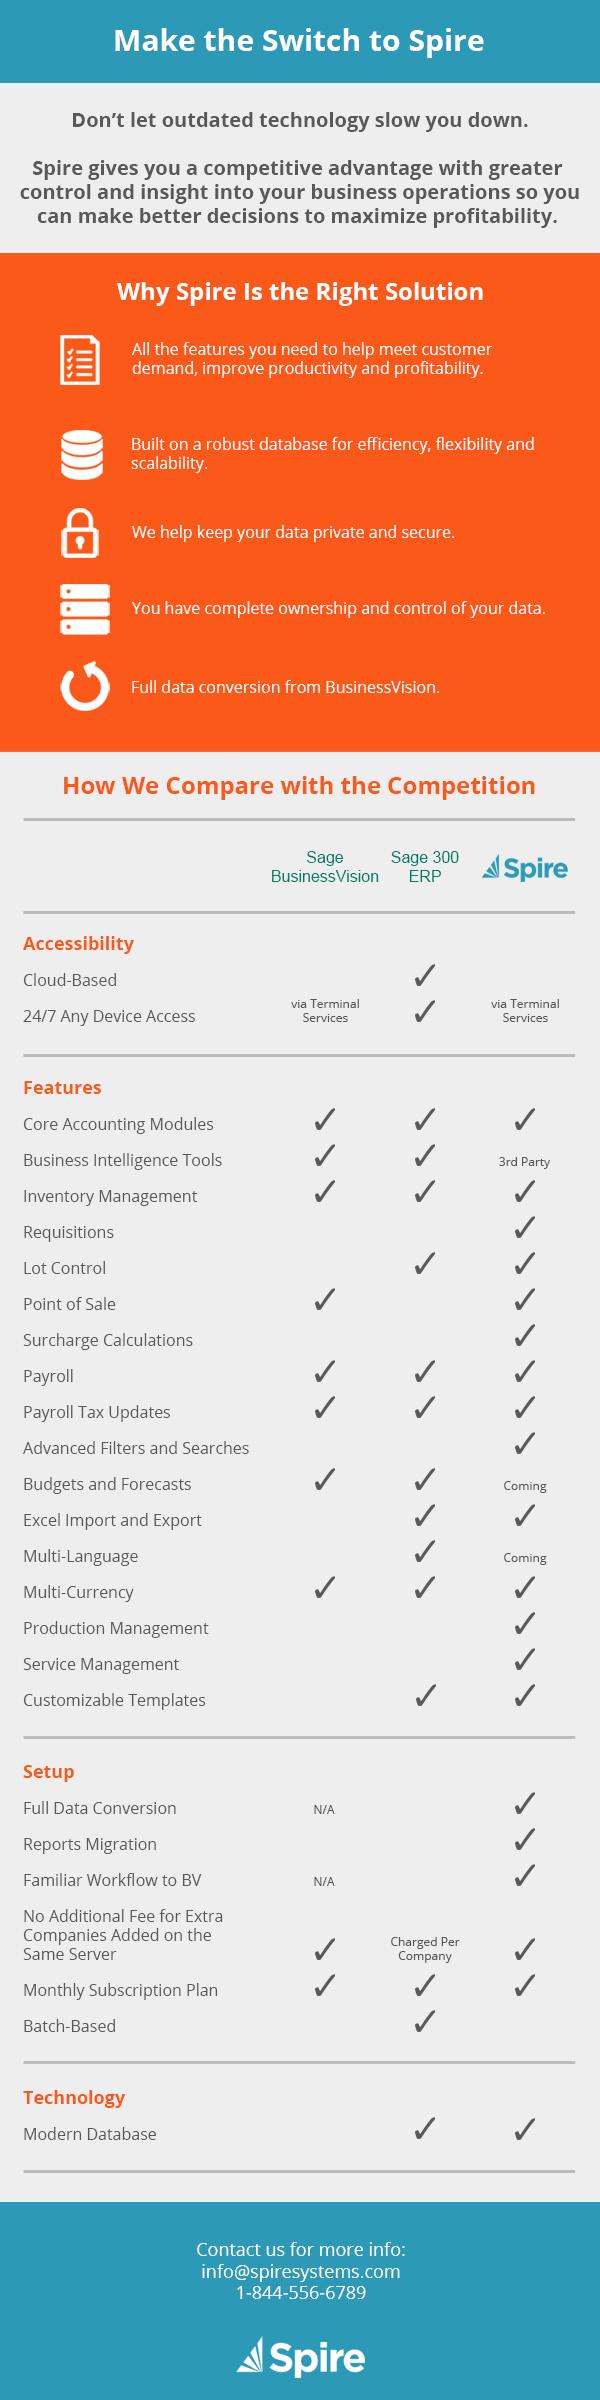 Comparing Sage 300 ERP, Sage BusinessVision, and Spire